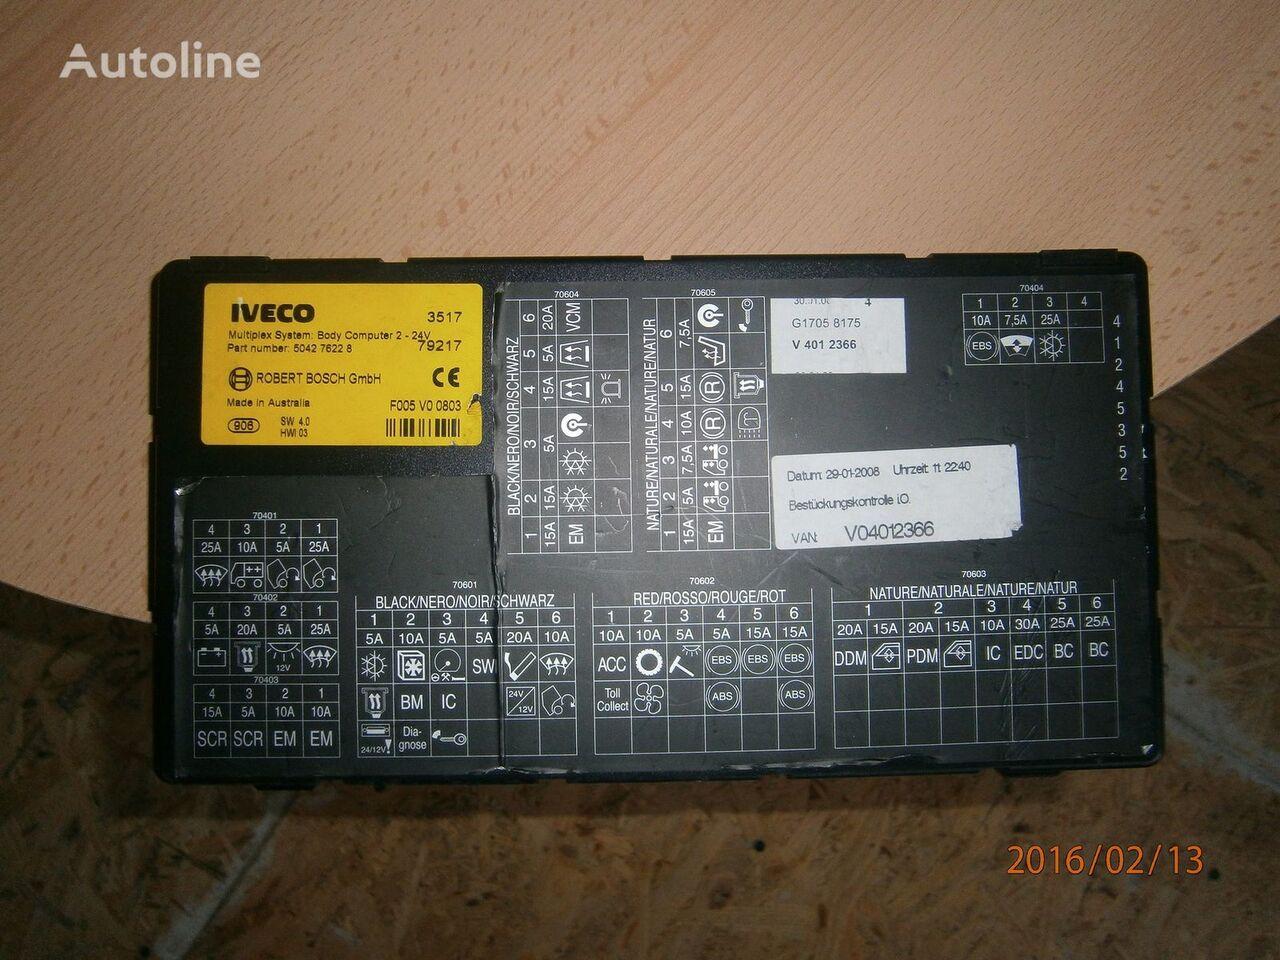 блок управления IVECO EURO5 Multiplex system body computer 504276228 для тягача IVECO Stralis